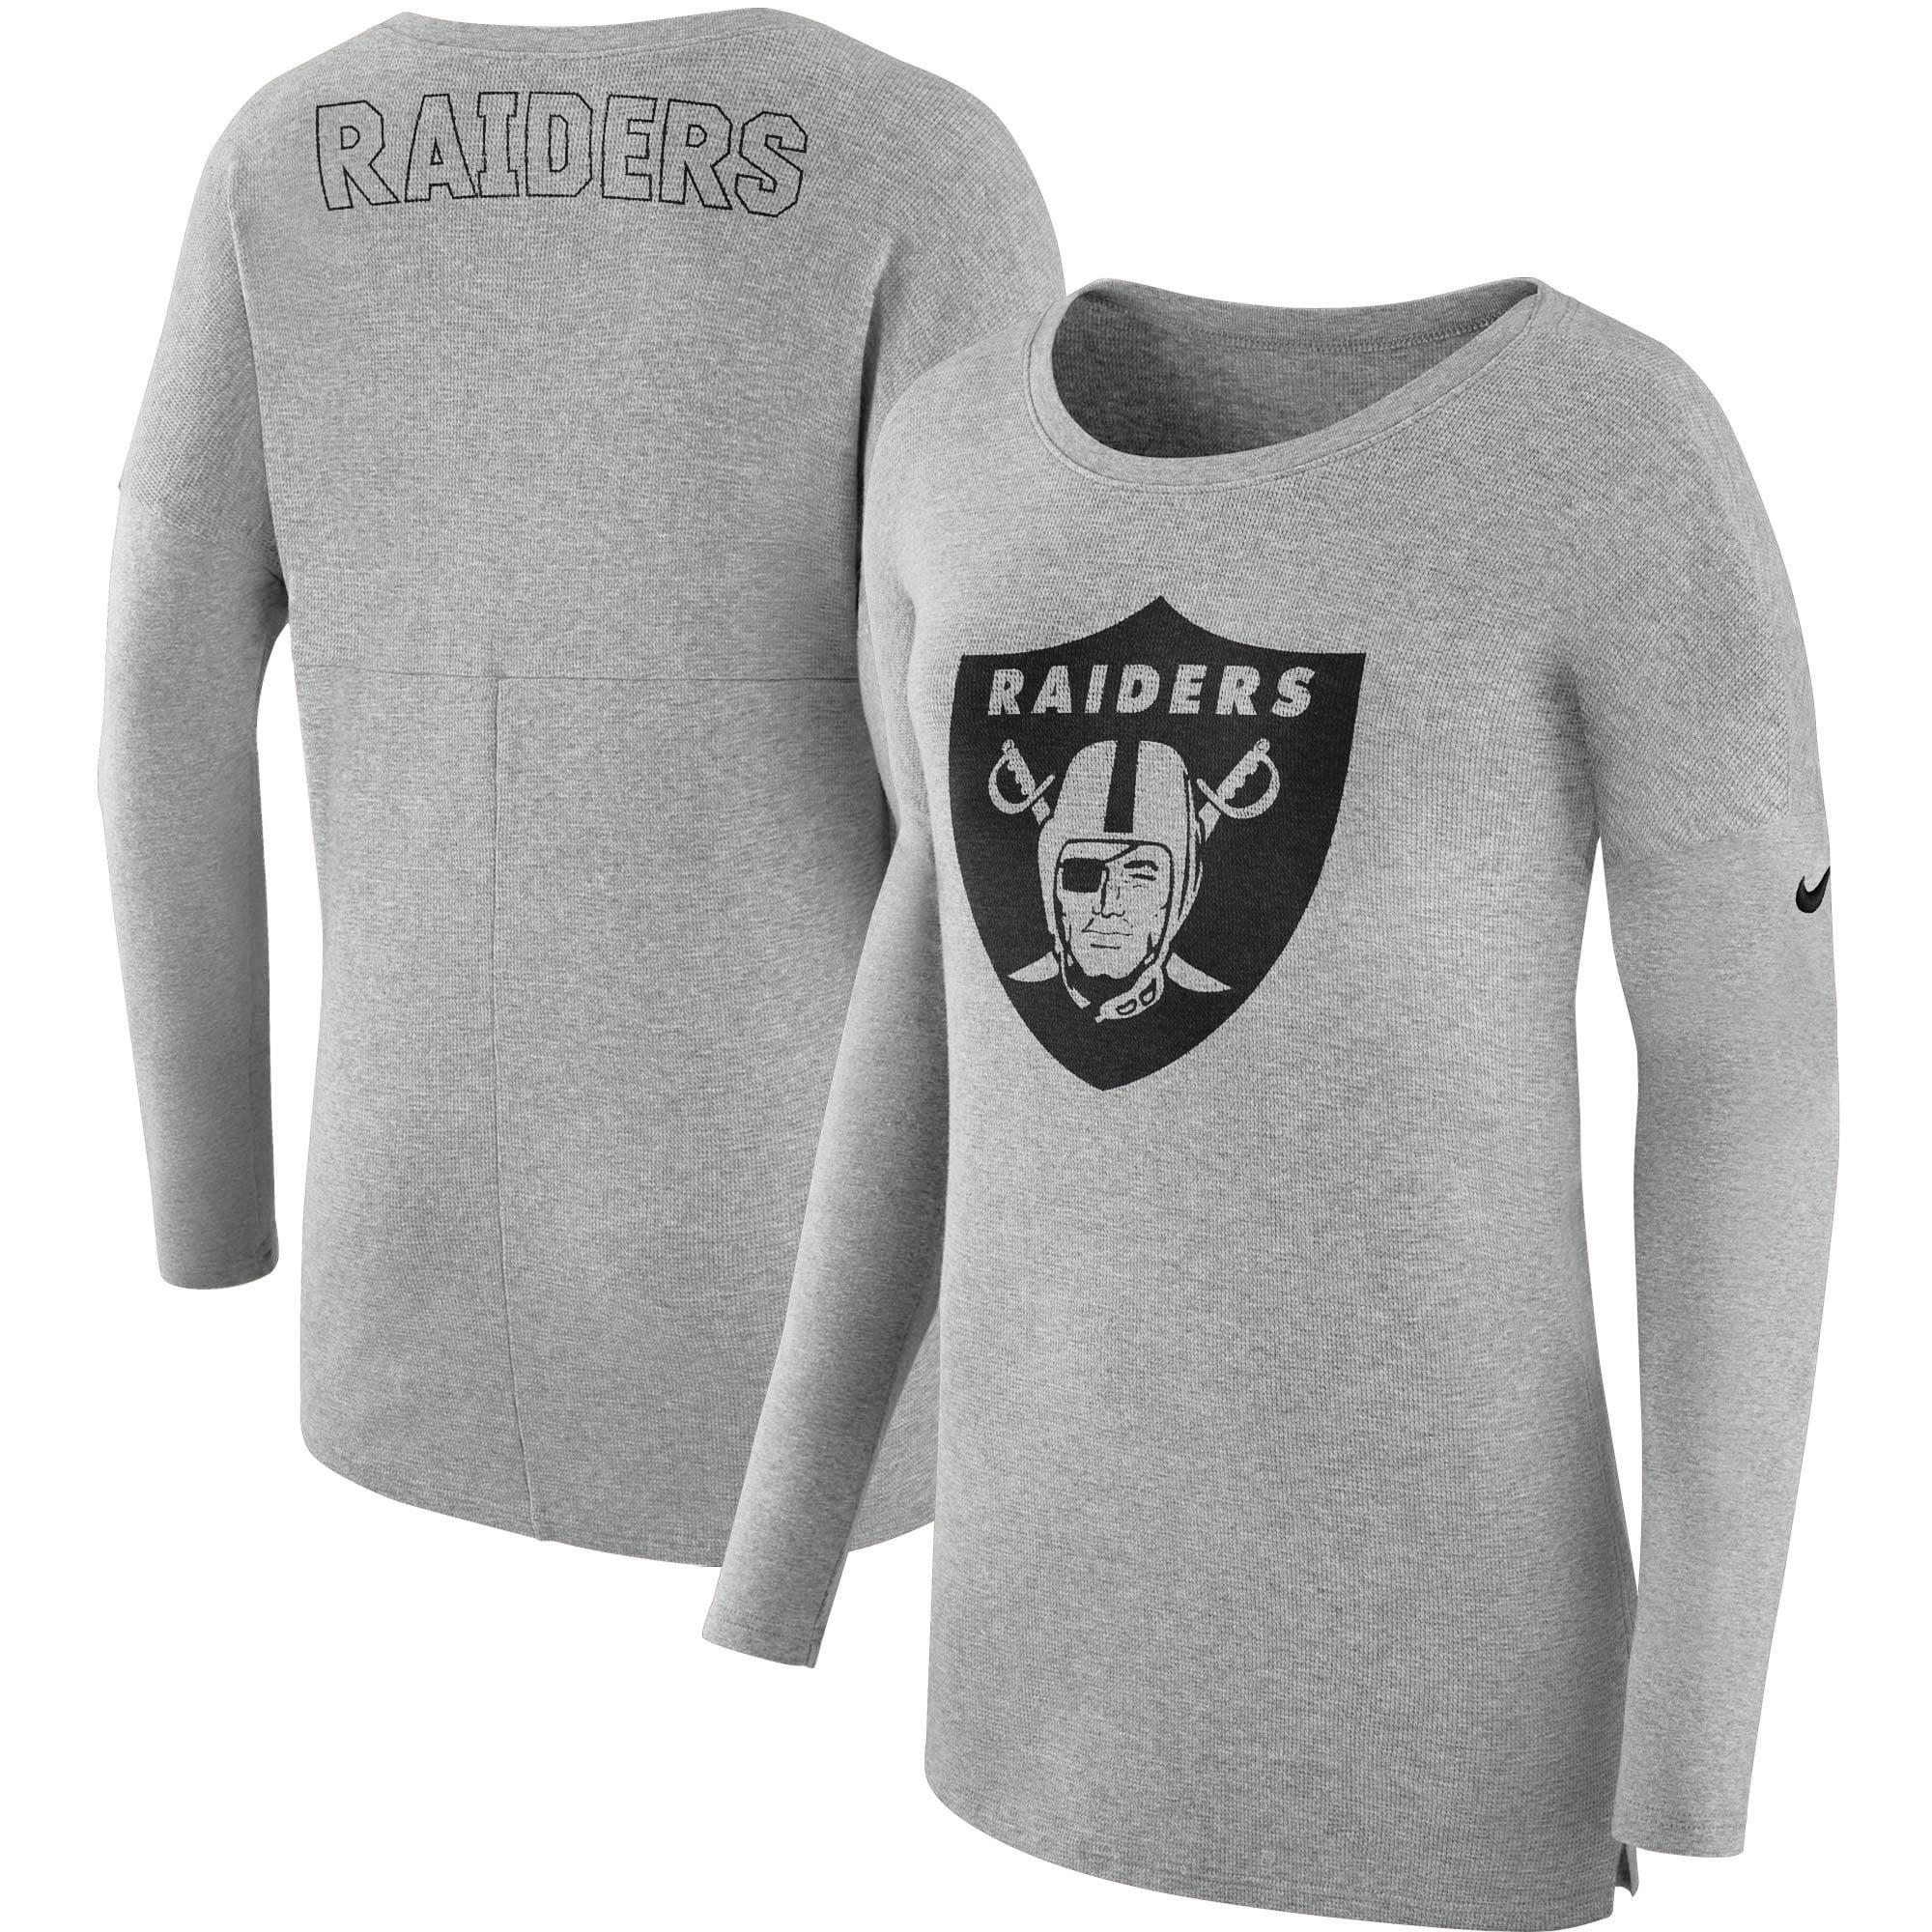 Oakland Raiders Nike Women's Cozy French Terry Crew Sweatshirt - Heathered Gray